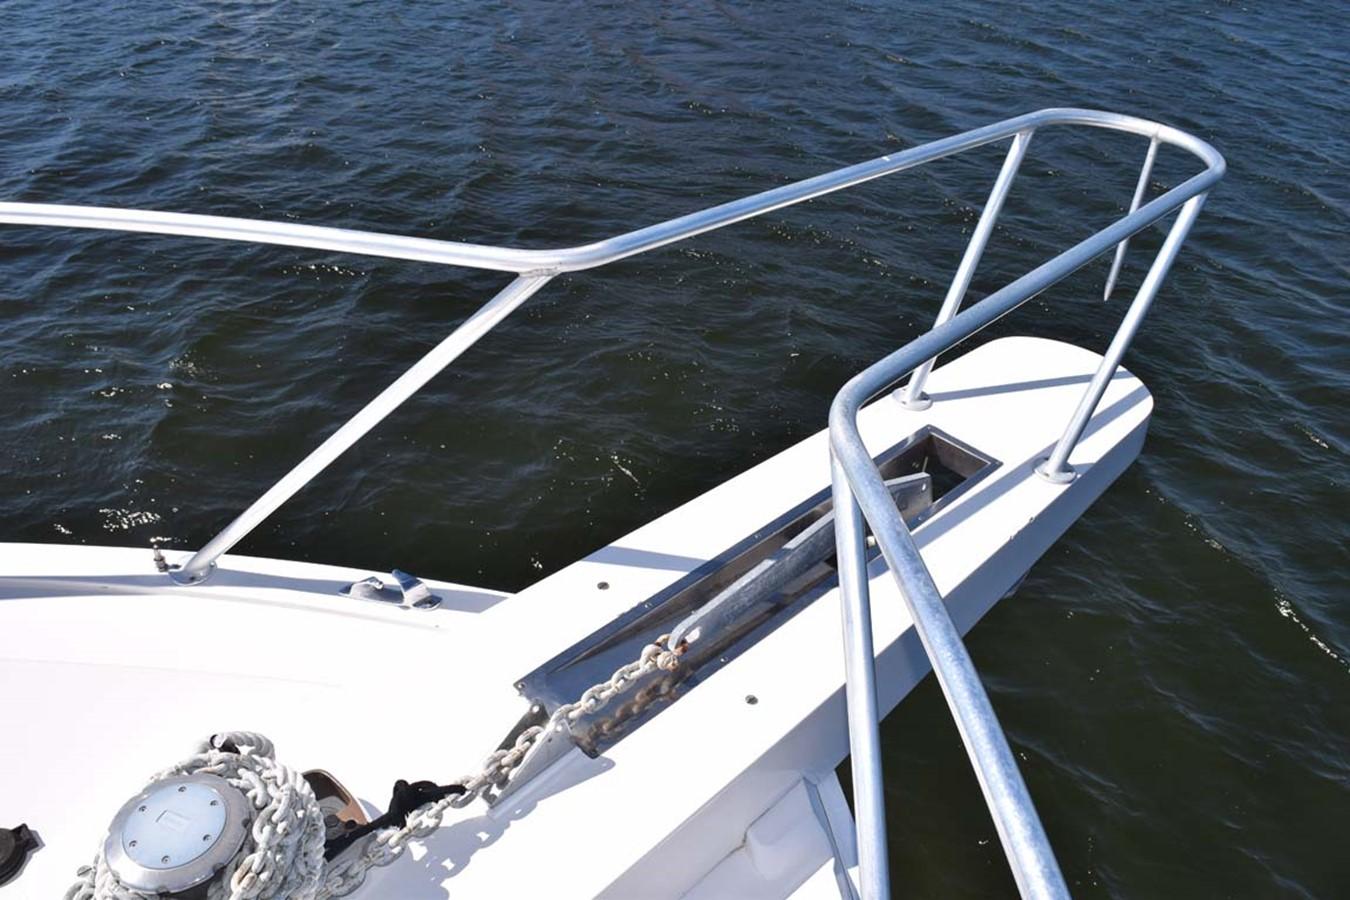 Bow Windlass and Anchor Chain 1998 BERTRAM 60 Convertible Sport Fisherman 2531928